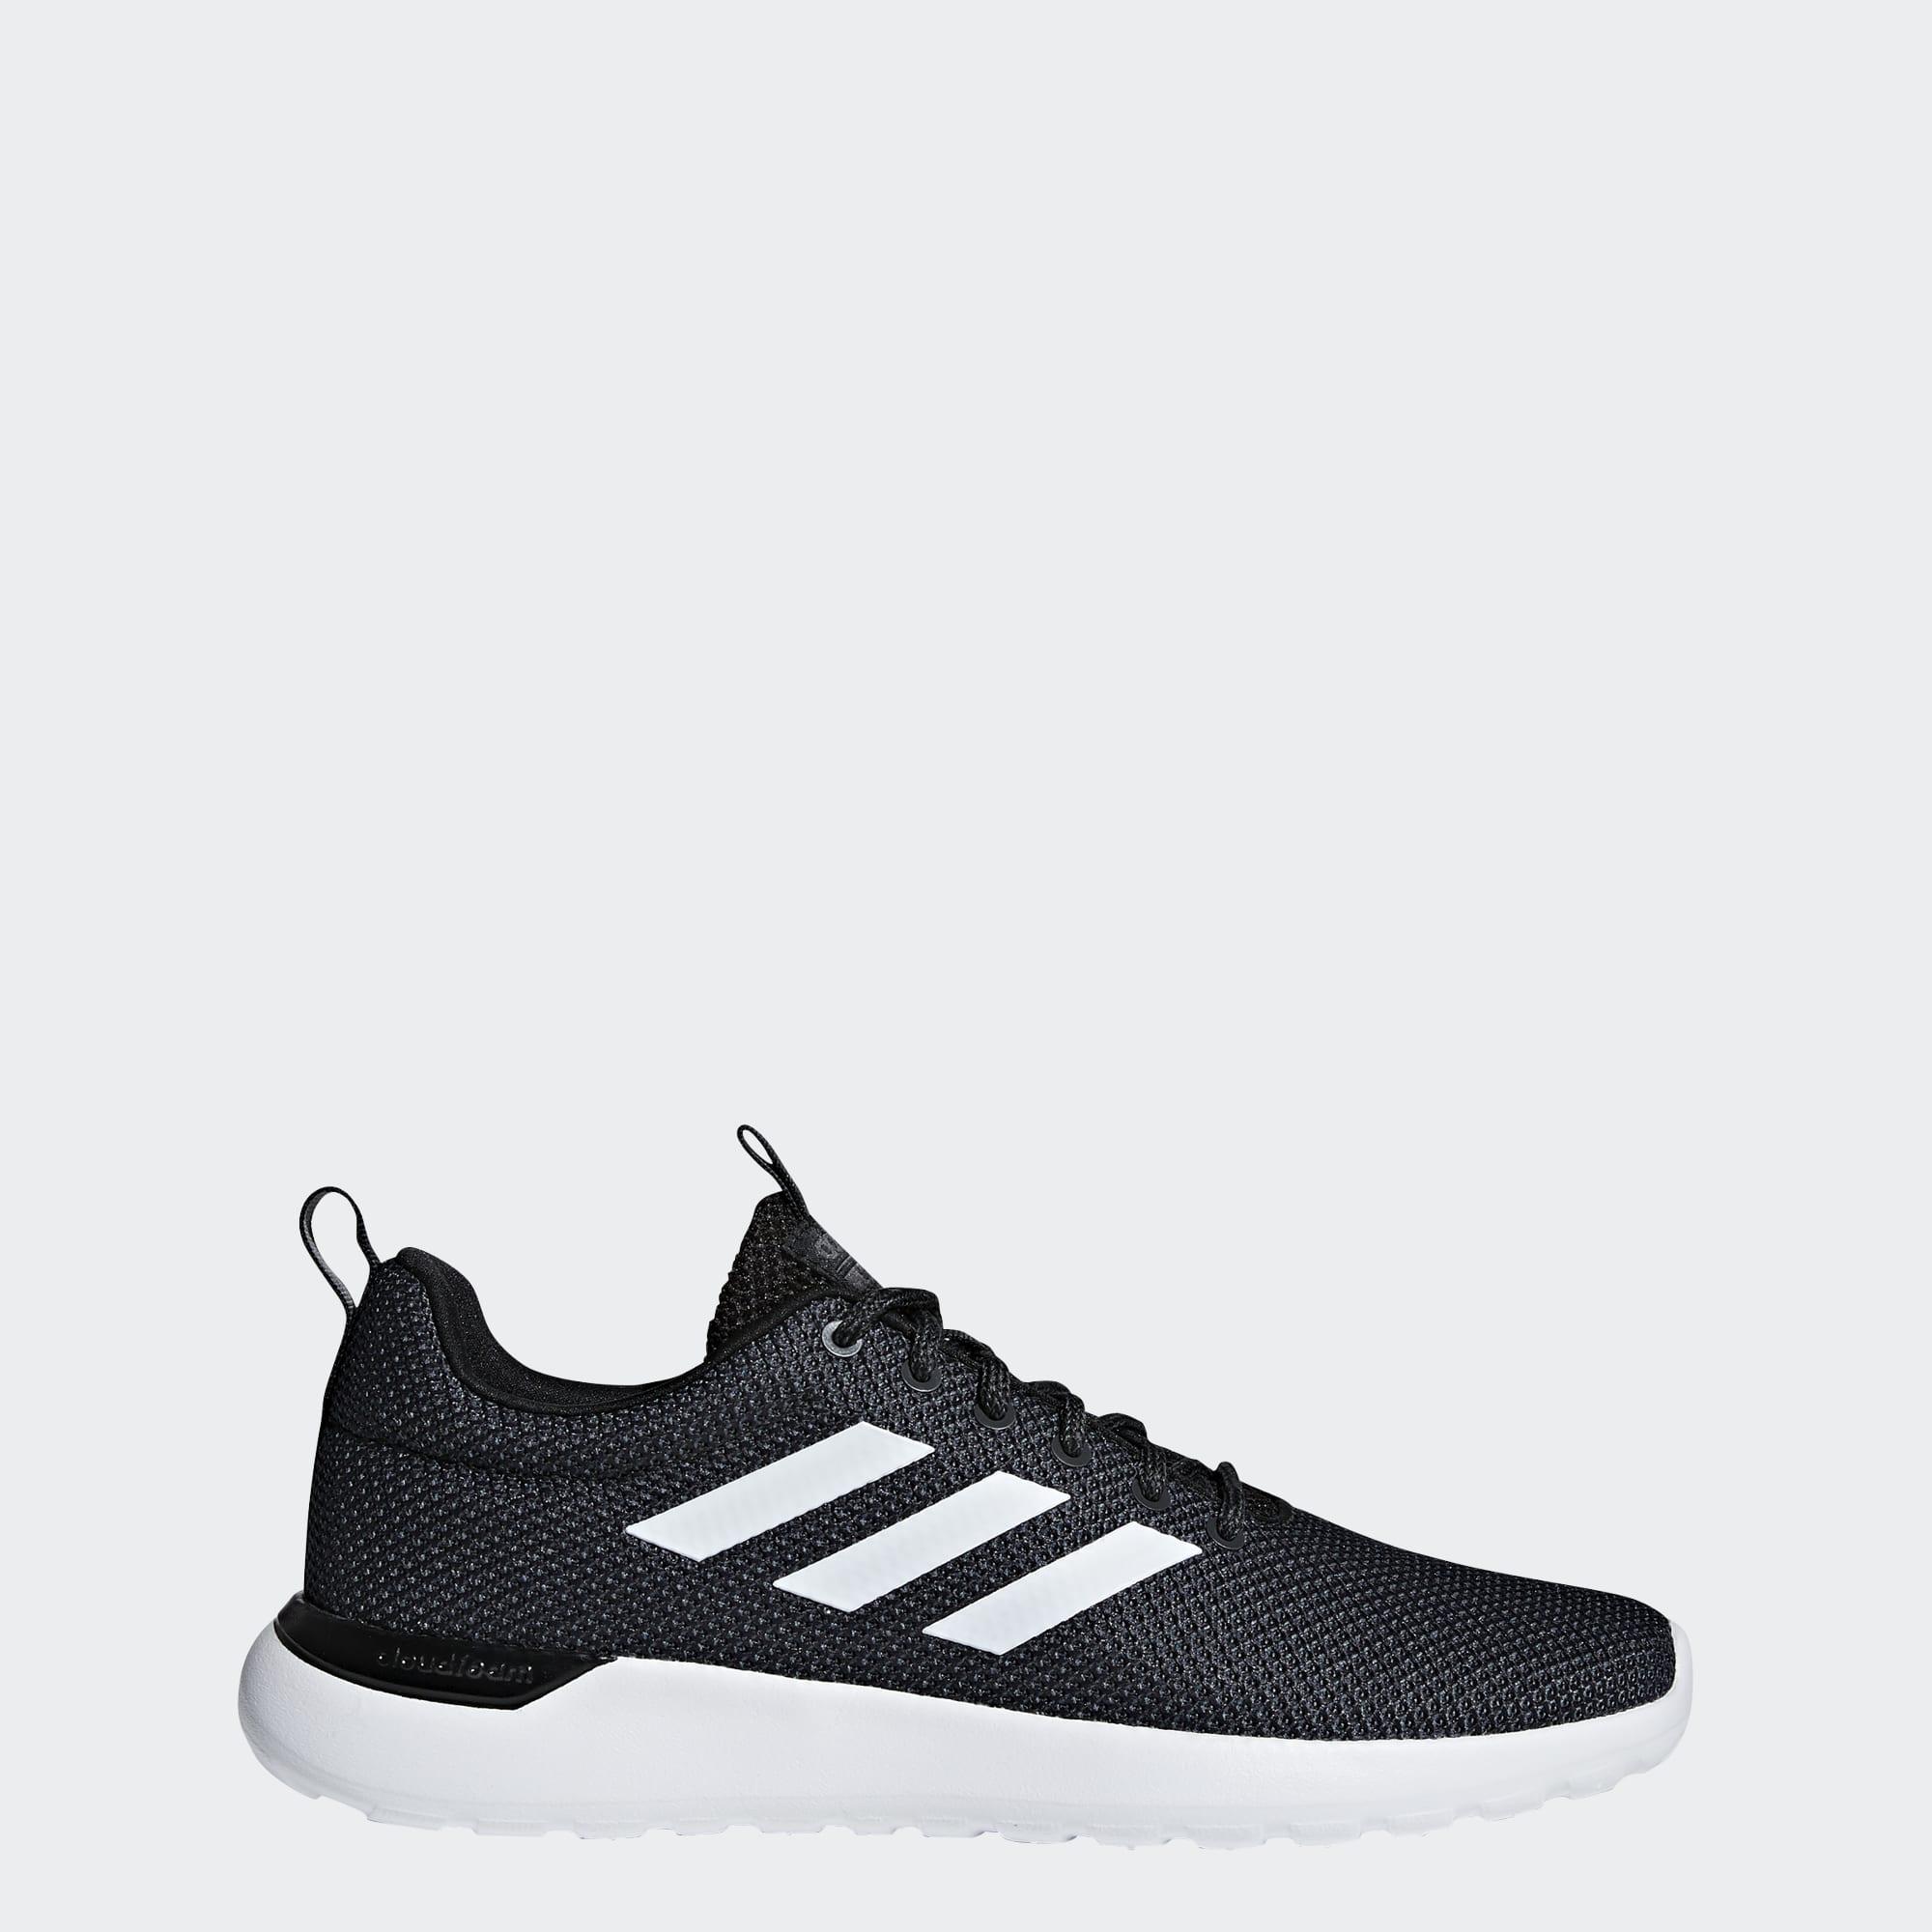 Adidas Lite Race CLN Men's Running Shoes - Black